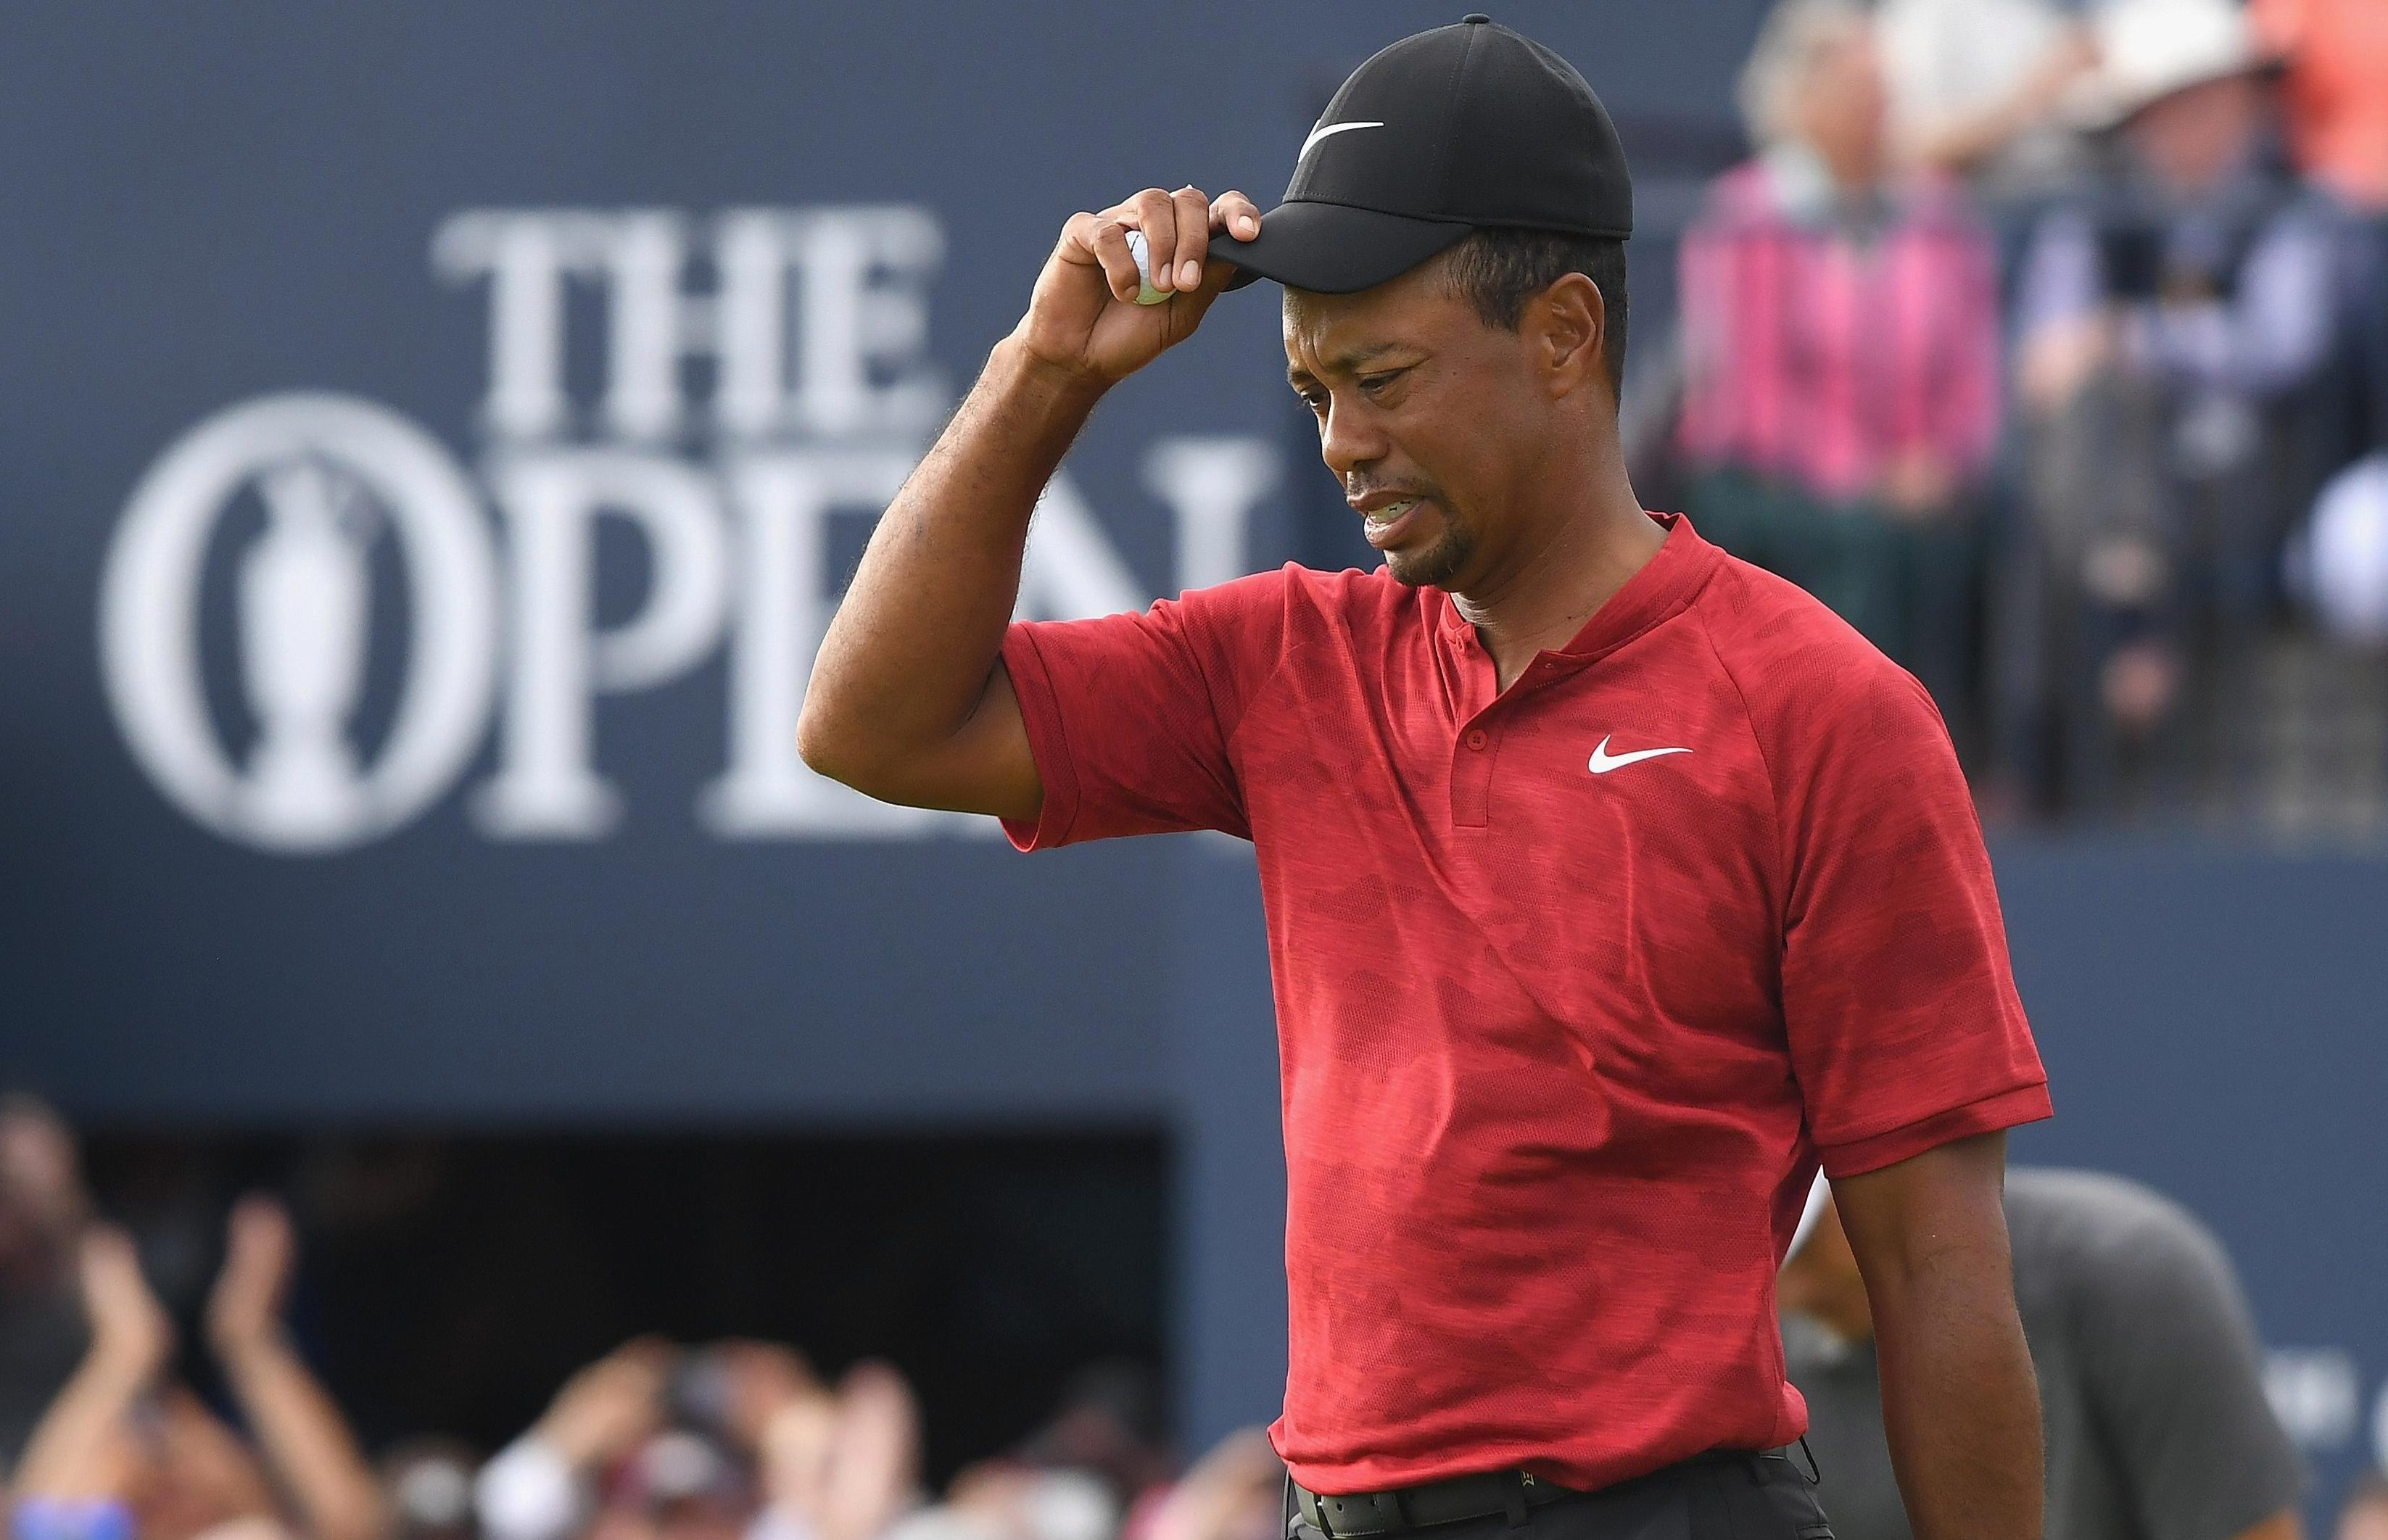 Woods finished three shots behind champion and playing partner Francesco Molinari